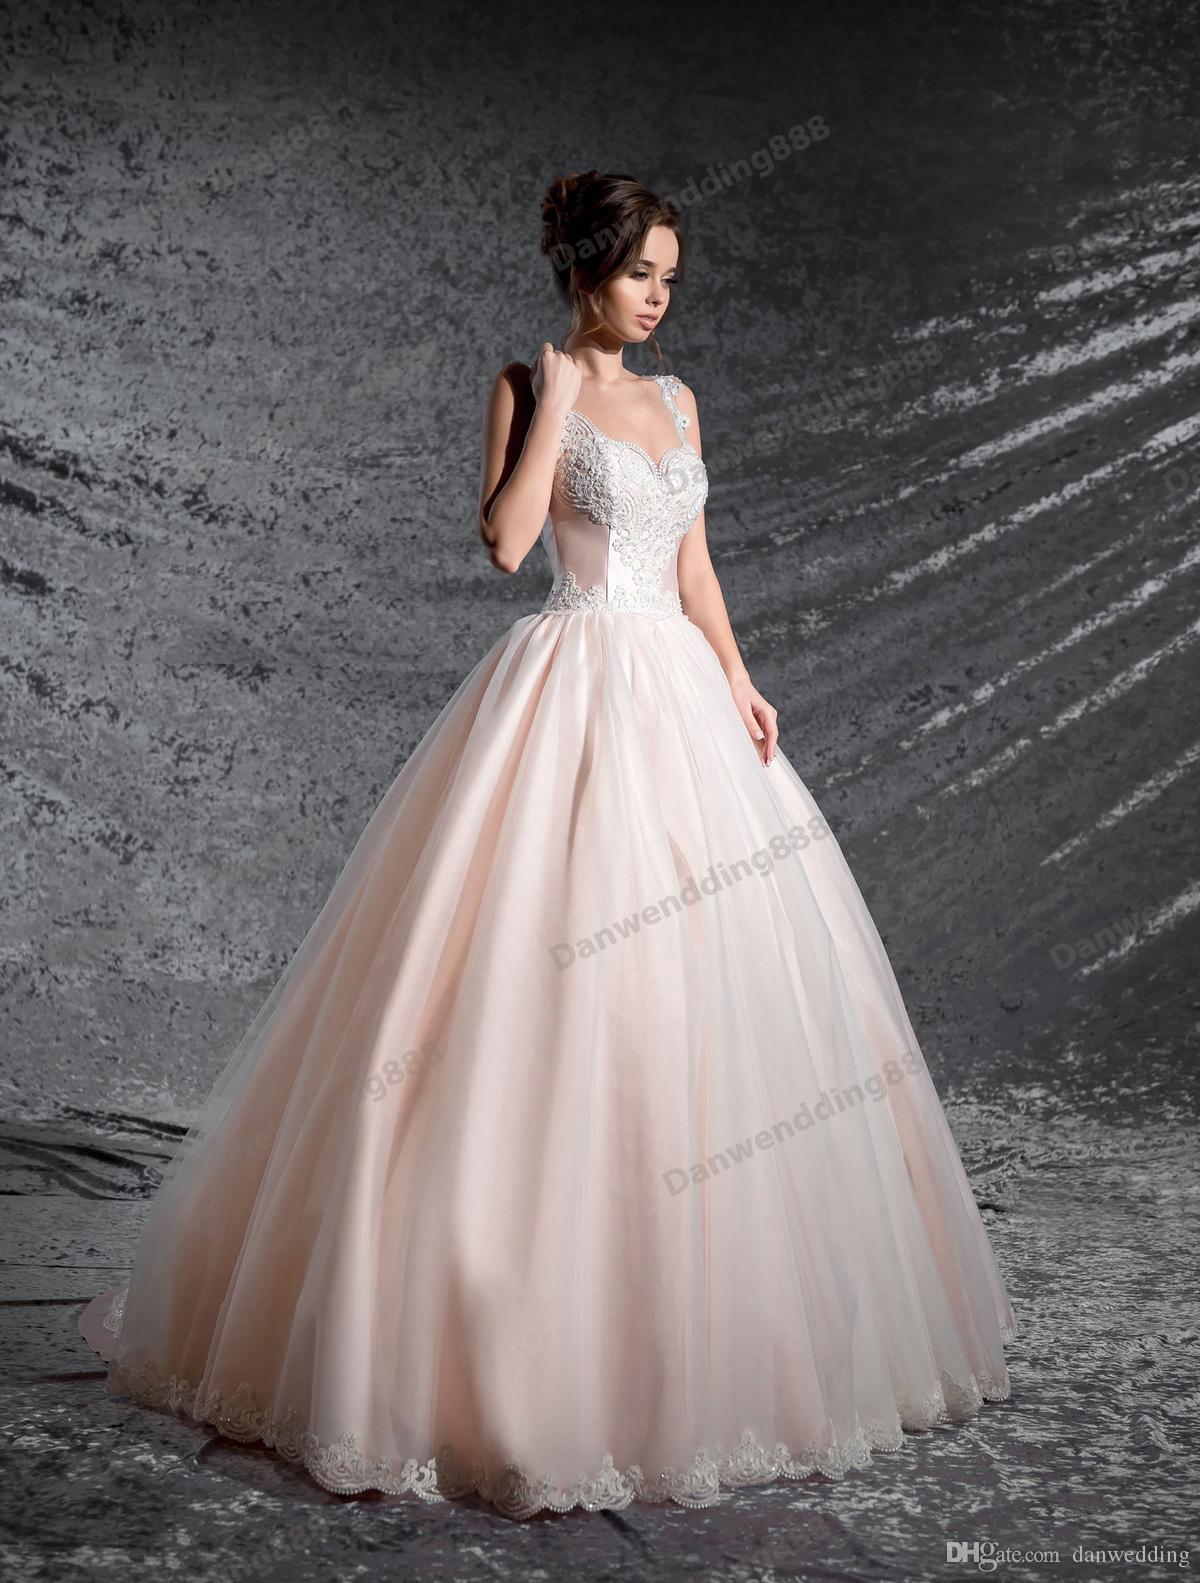 Beauty Pink Champagne Tulle Scoop Applique A-Line Wedding Dresses Bridal Pageant Dresses Wedding Attire Dresses Custom Size 2-16 ZW607020